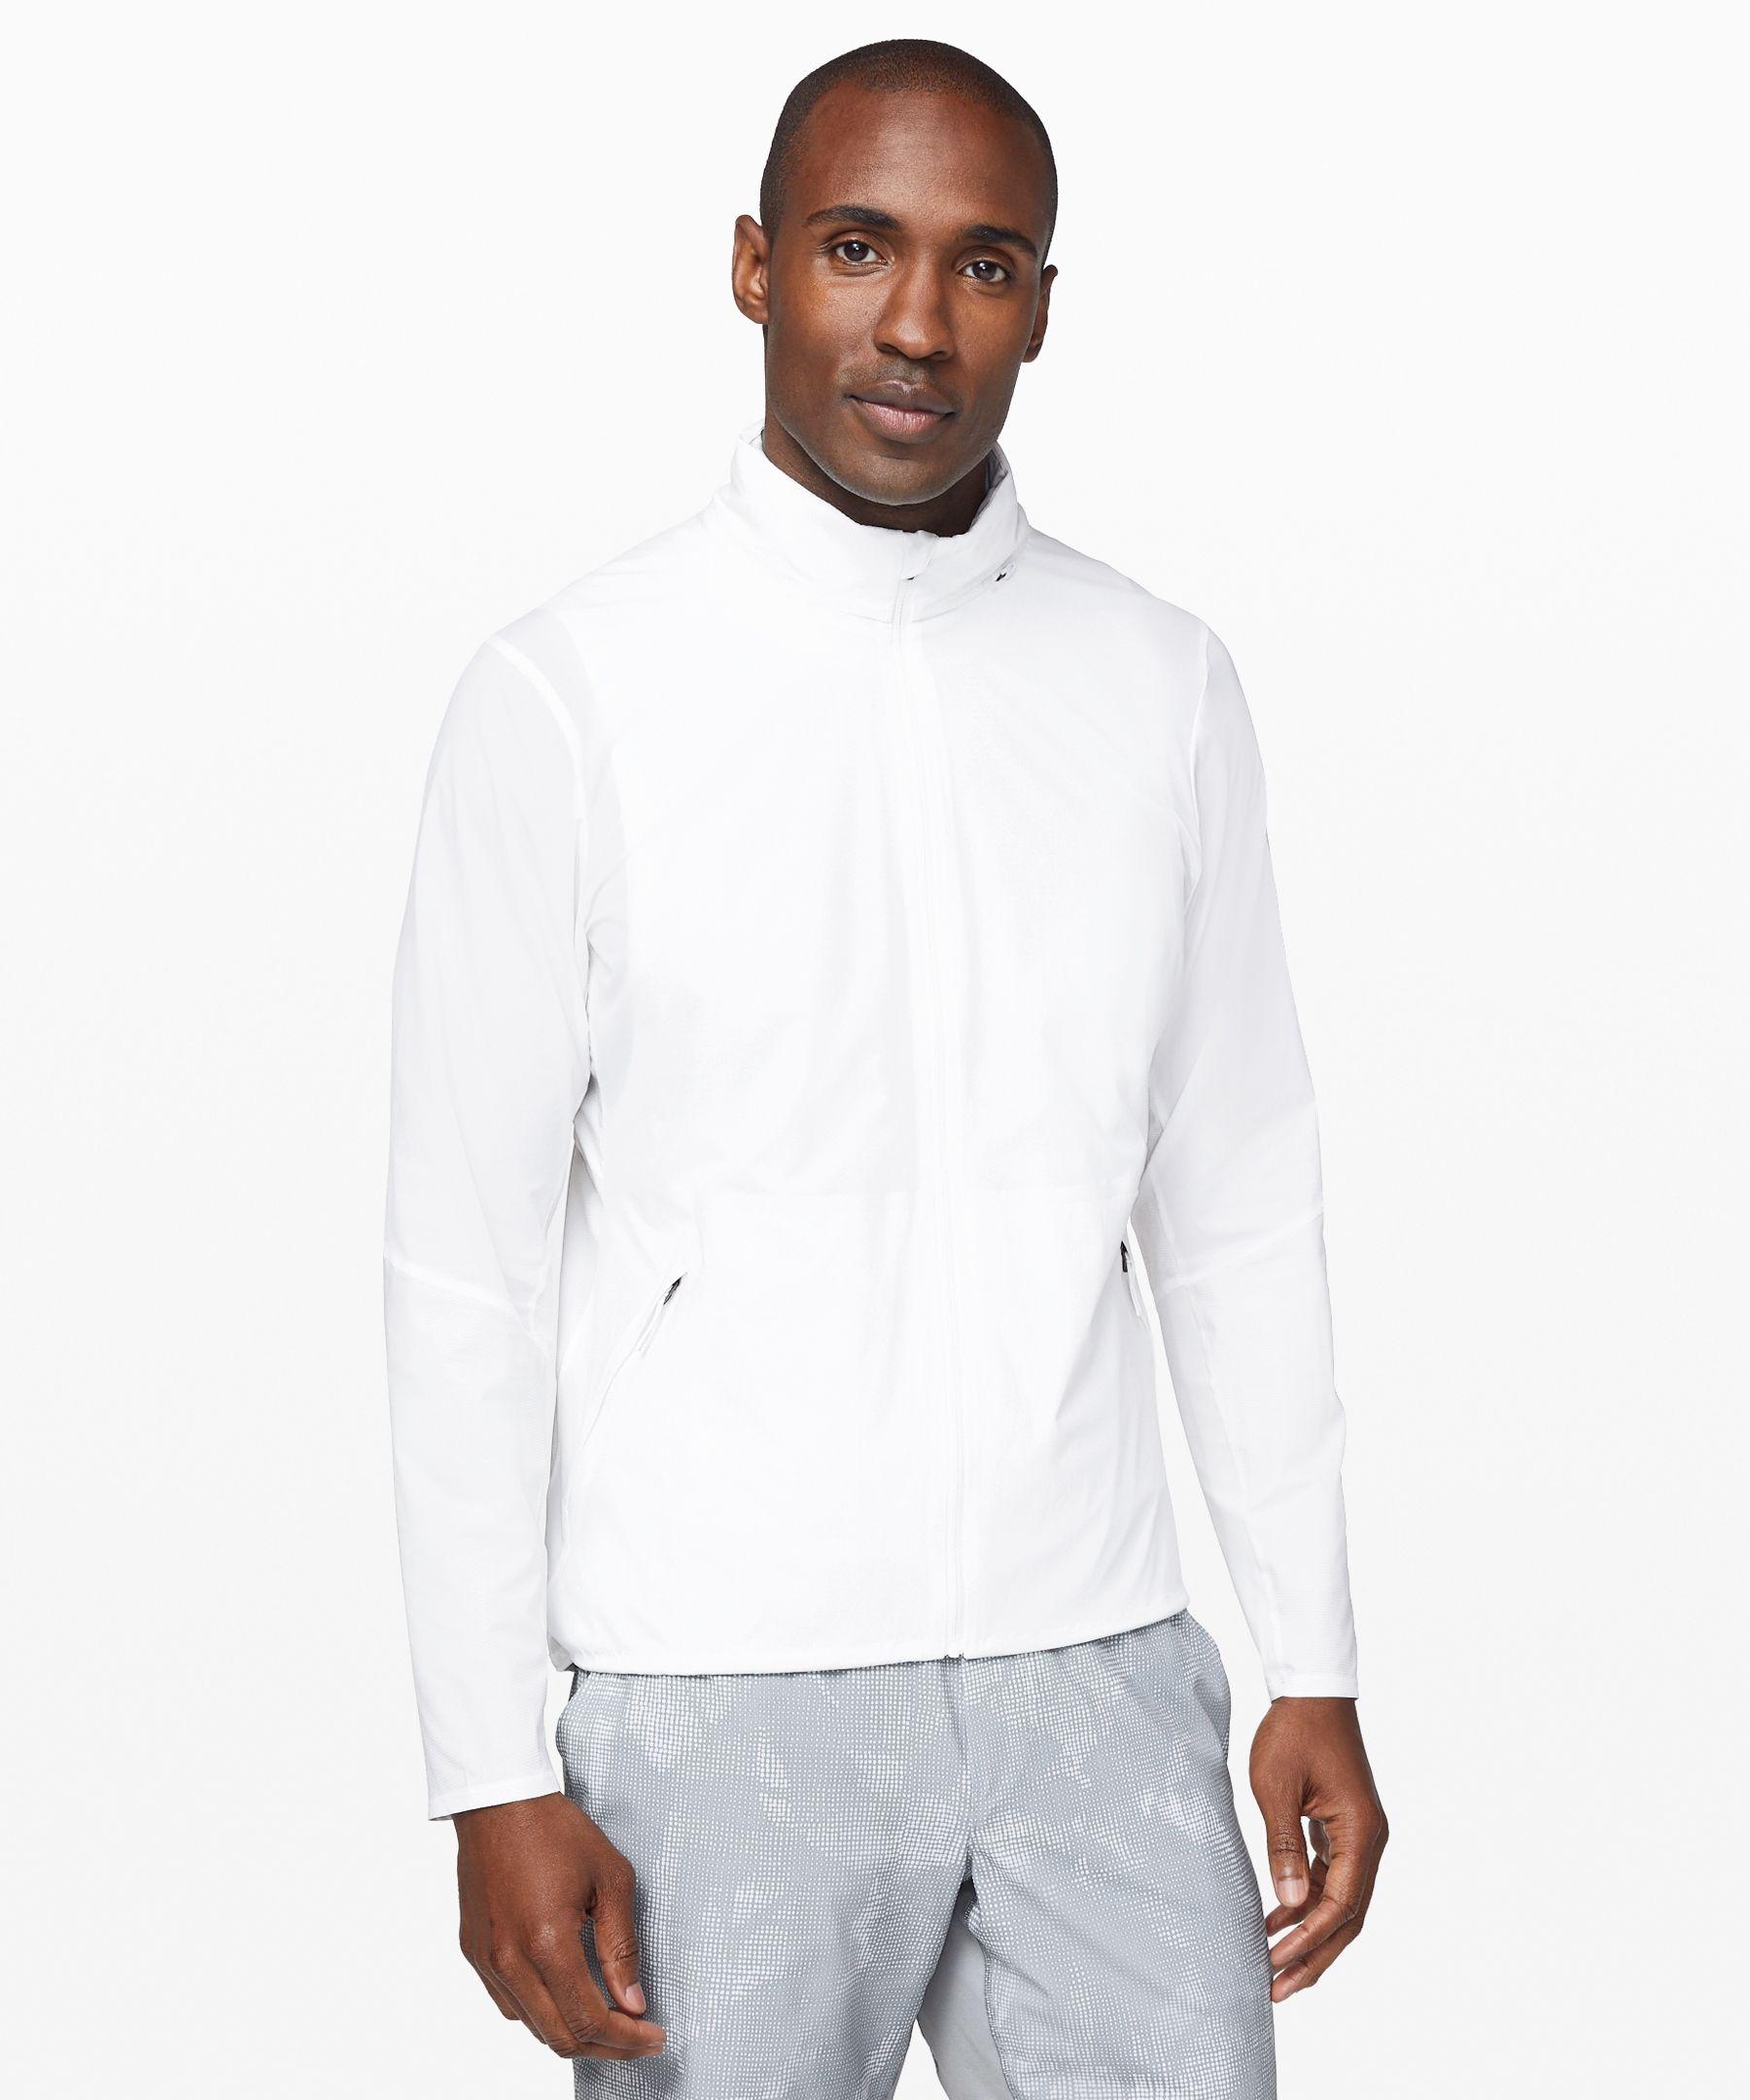 Active Jacket | Men's Jackets + Hoodies | lululemon | Active jacket,  Lululemon men, Jackets